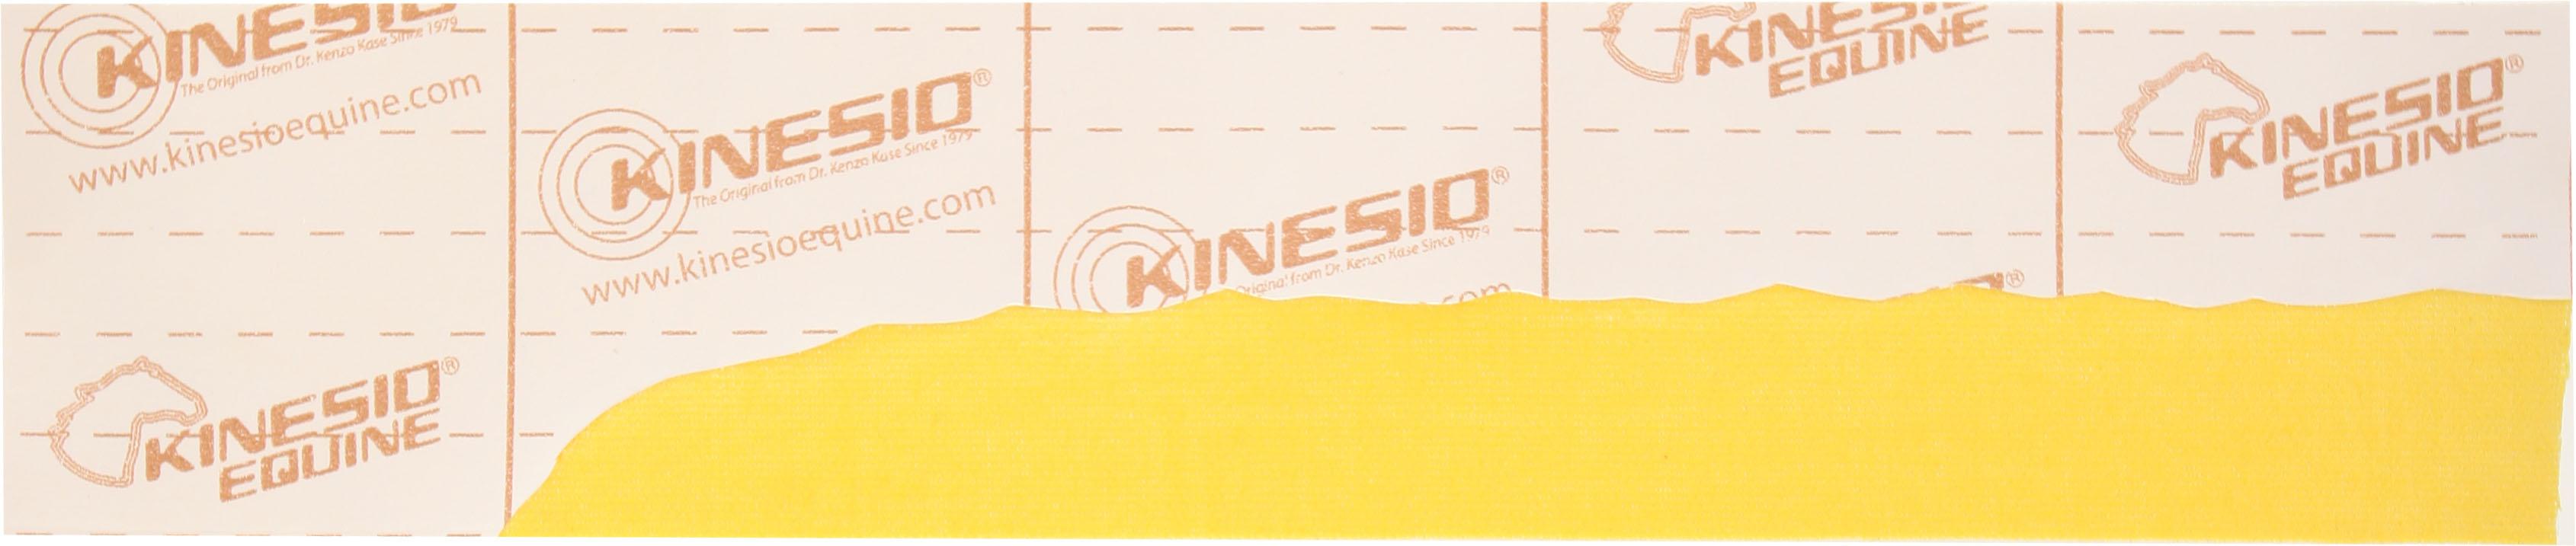 kinesio-tape-equine-strip.jpg